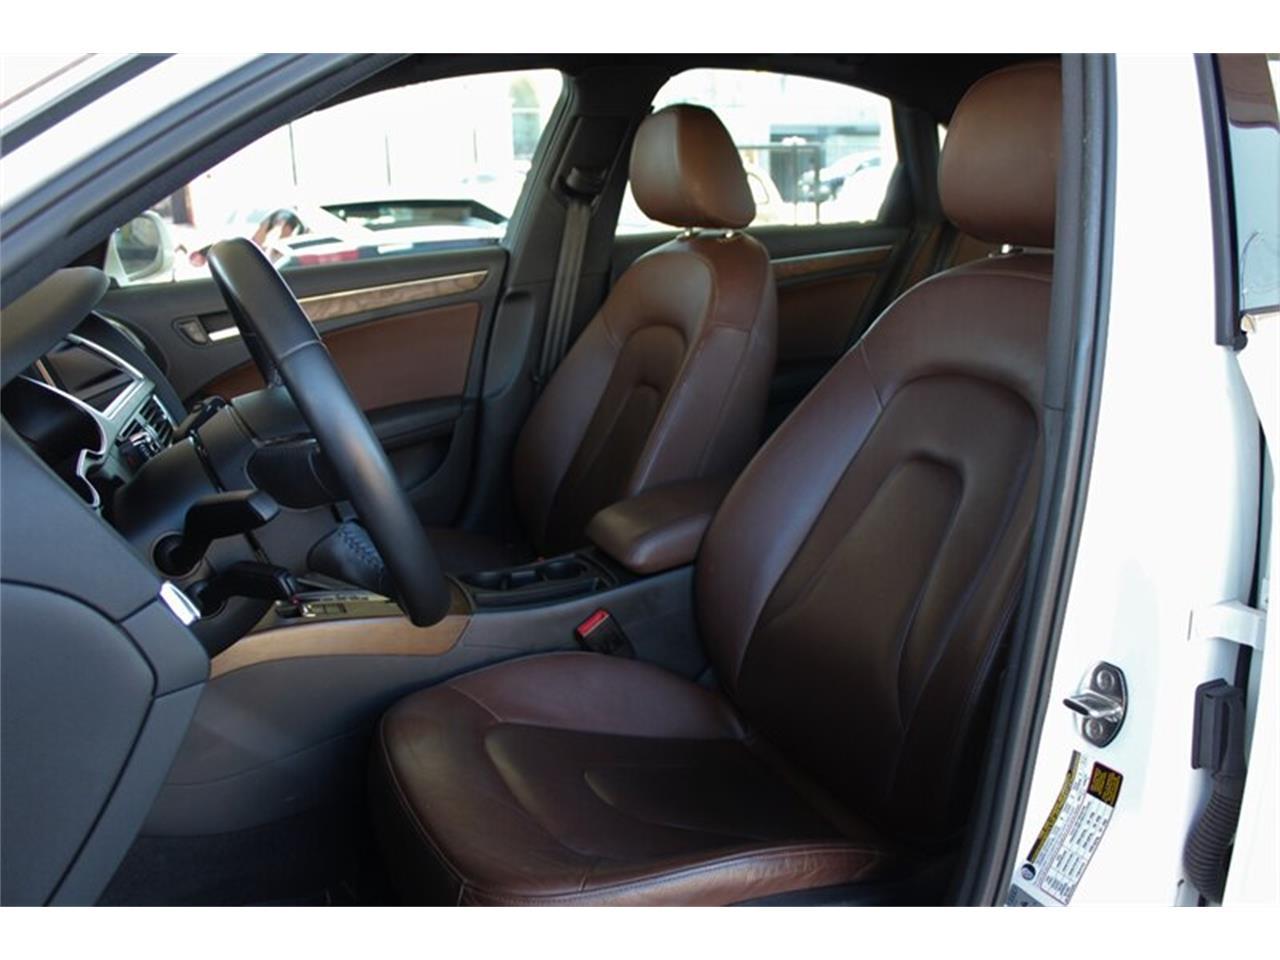 2014 Audi A4 (CC-1246438) for sale in Sherman Oaks, California